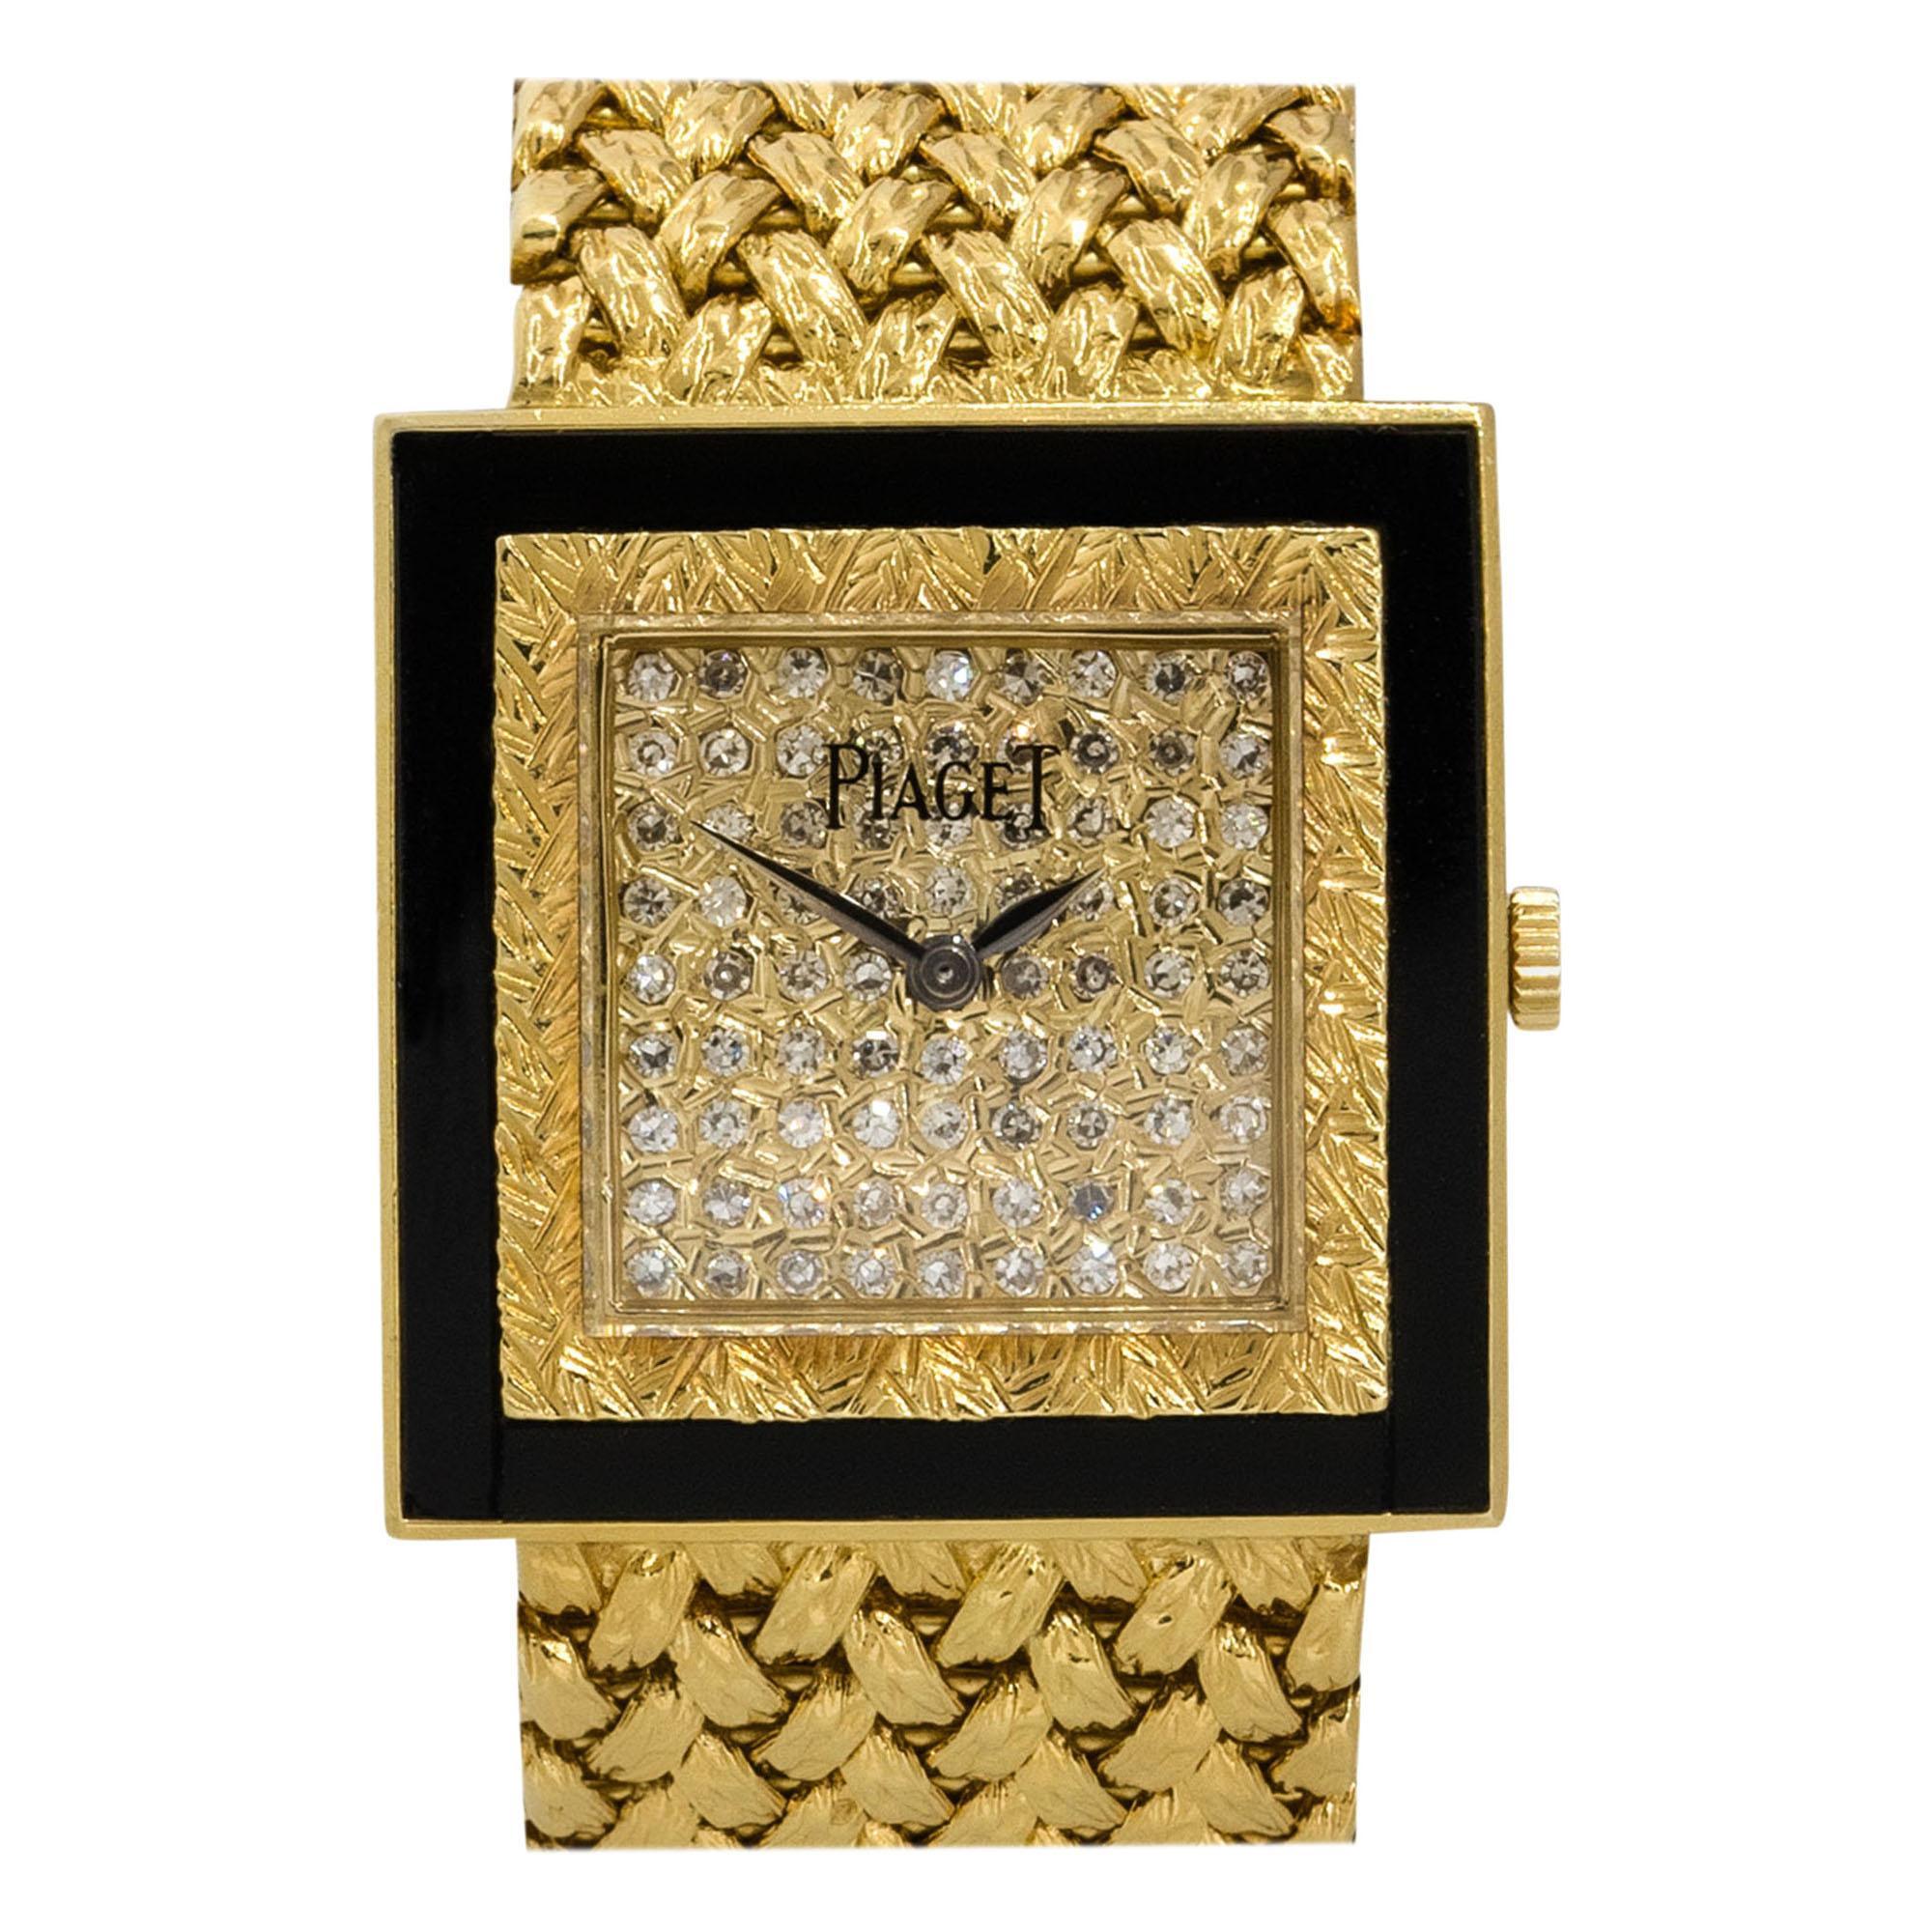 Piaget 92002D2 18k Yellow Gold Diamond Onyx Ladies Watch